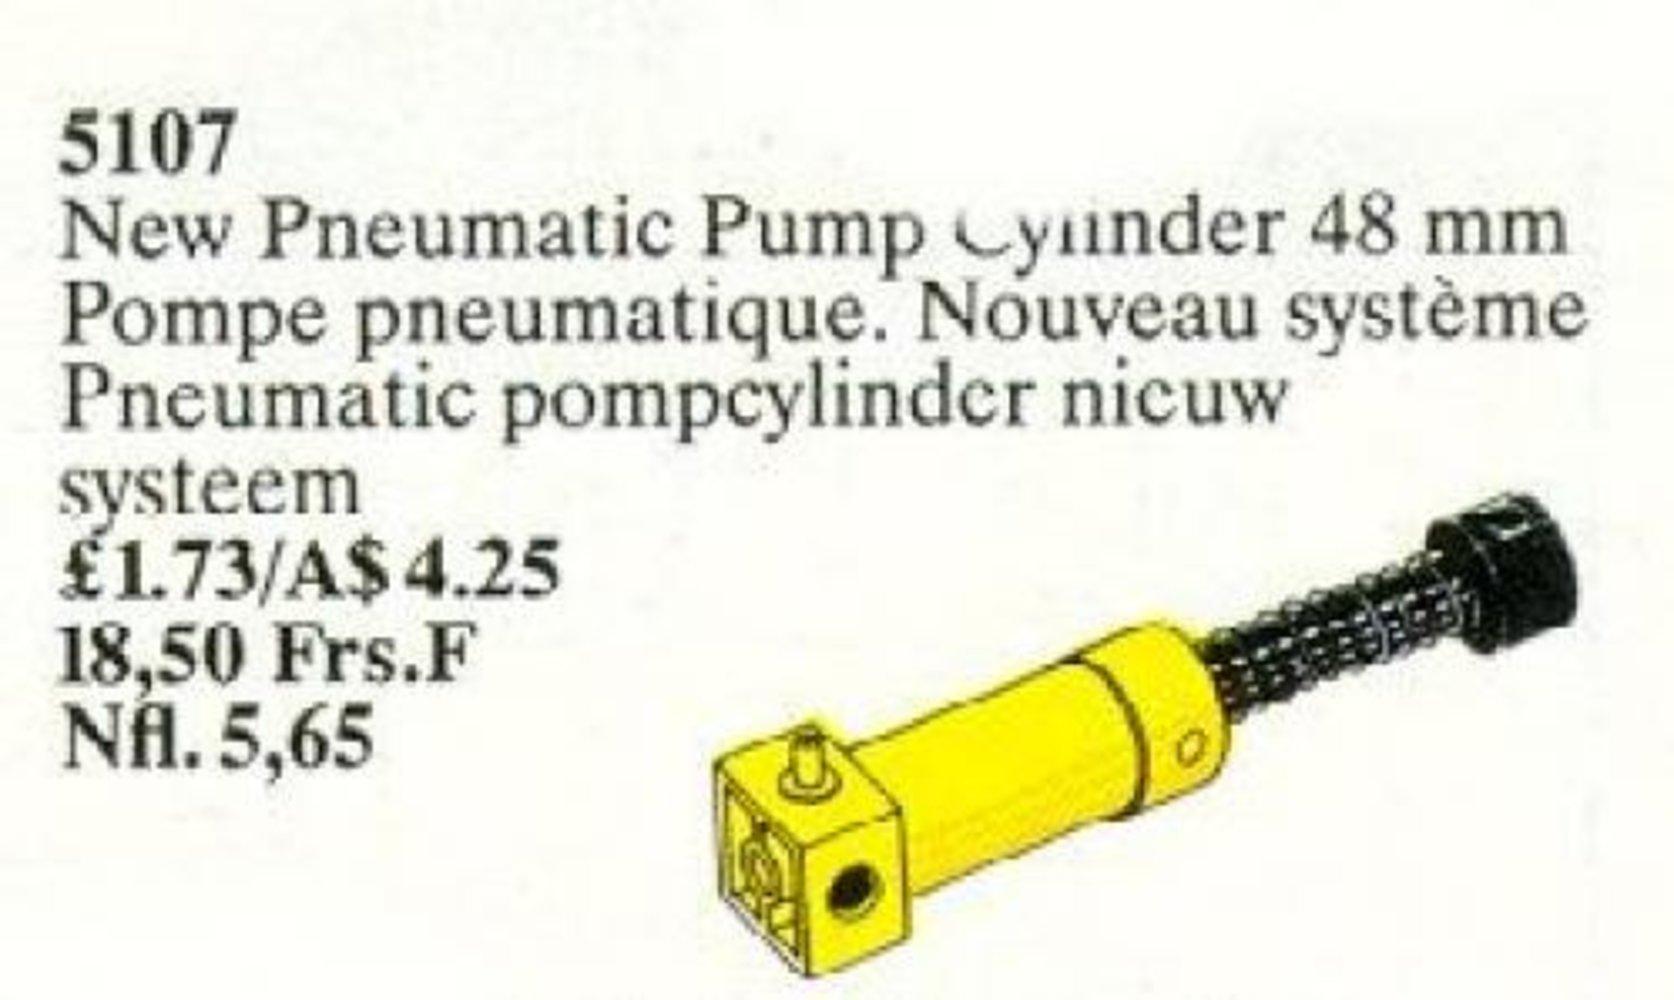 Pneumatic Pump 2 Cylinder